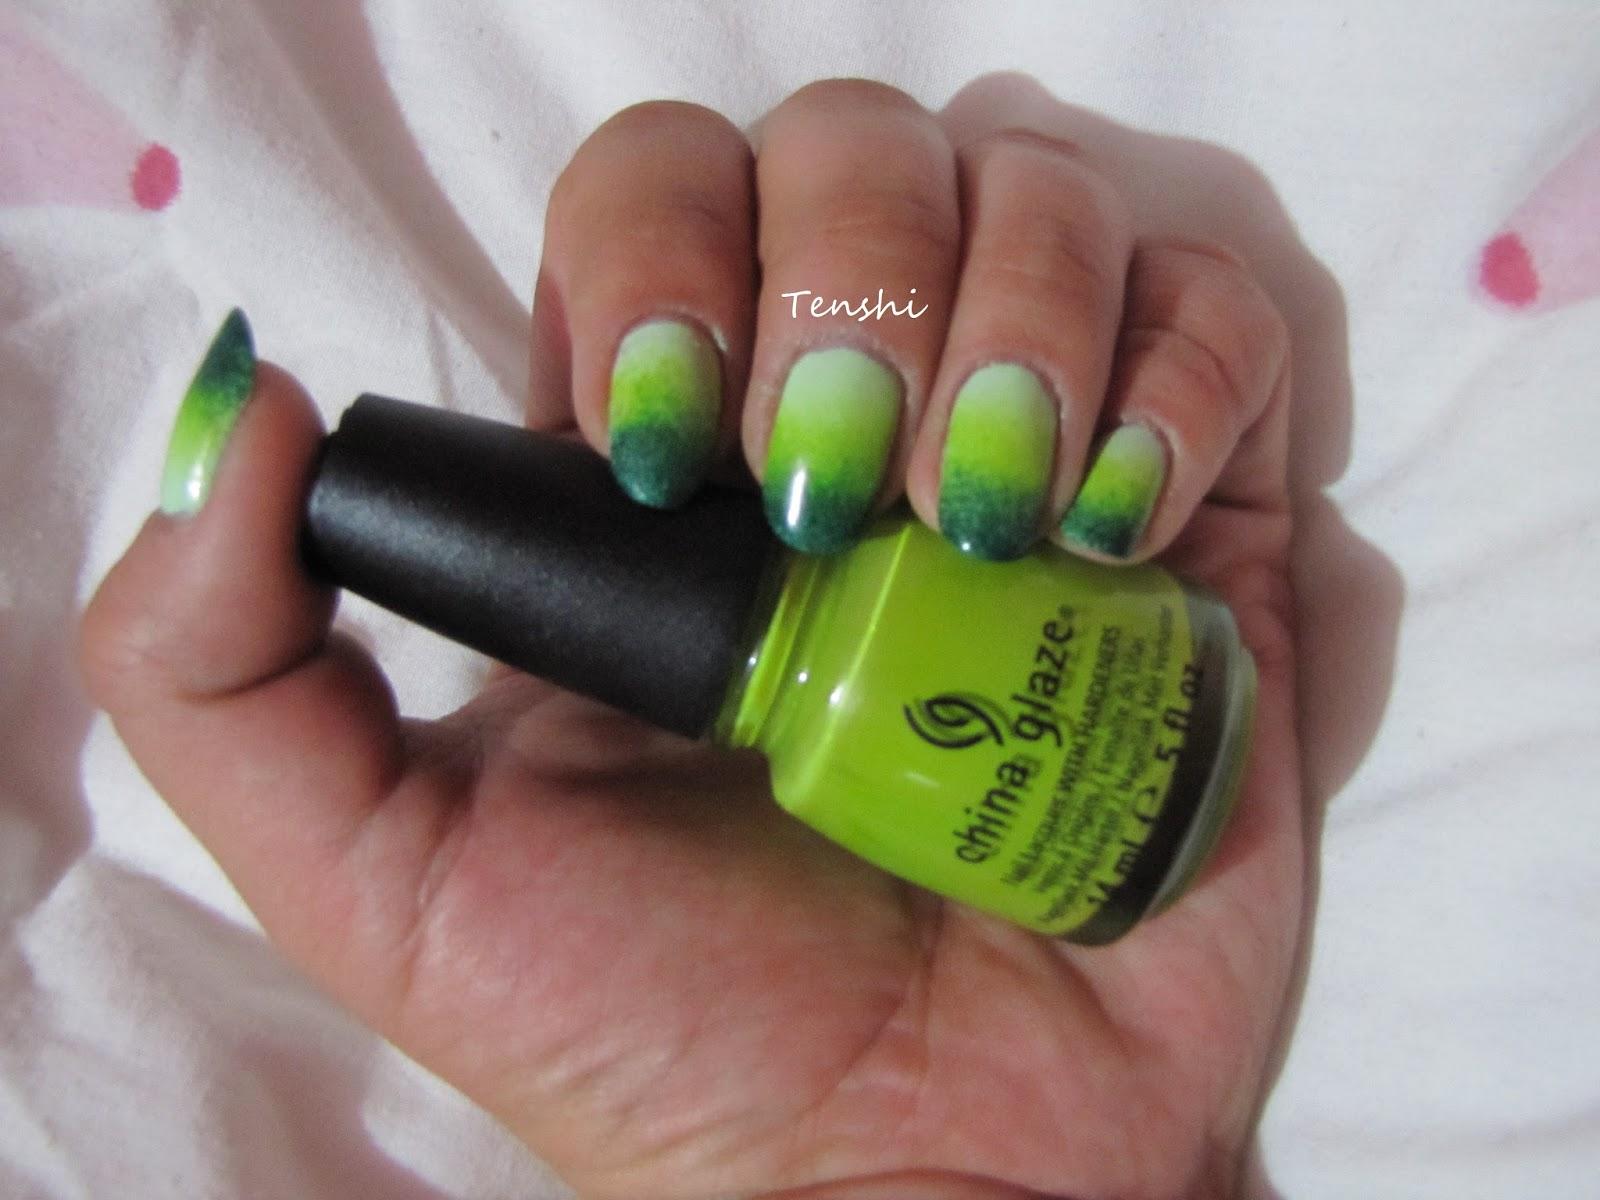 Excepcional Dos Colores Uñas Modelo - Ideas de Pintar de Uñas ...